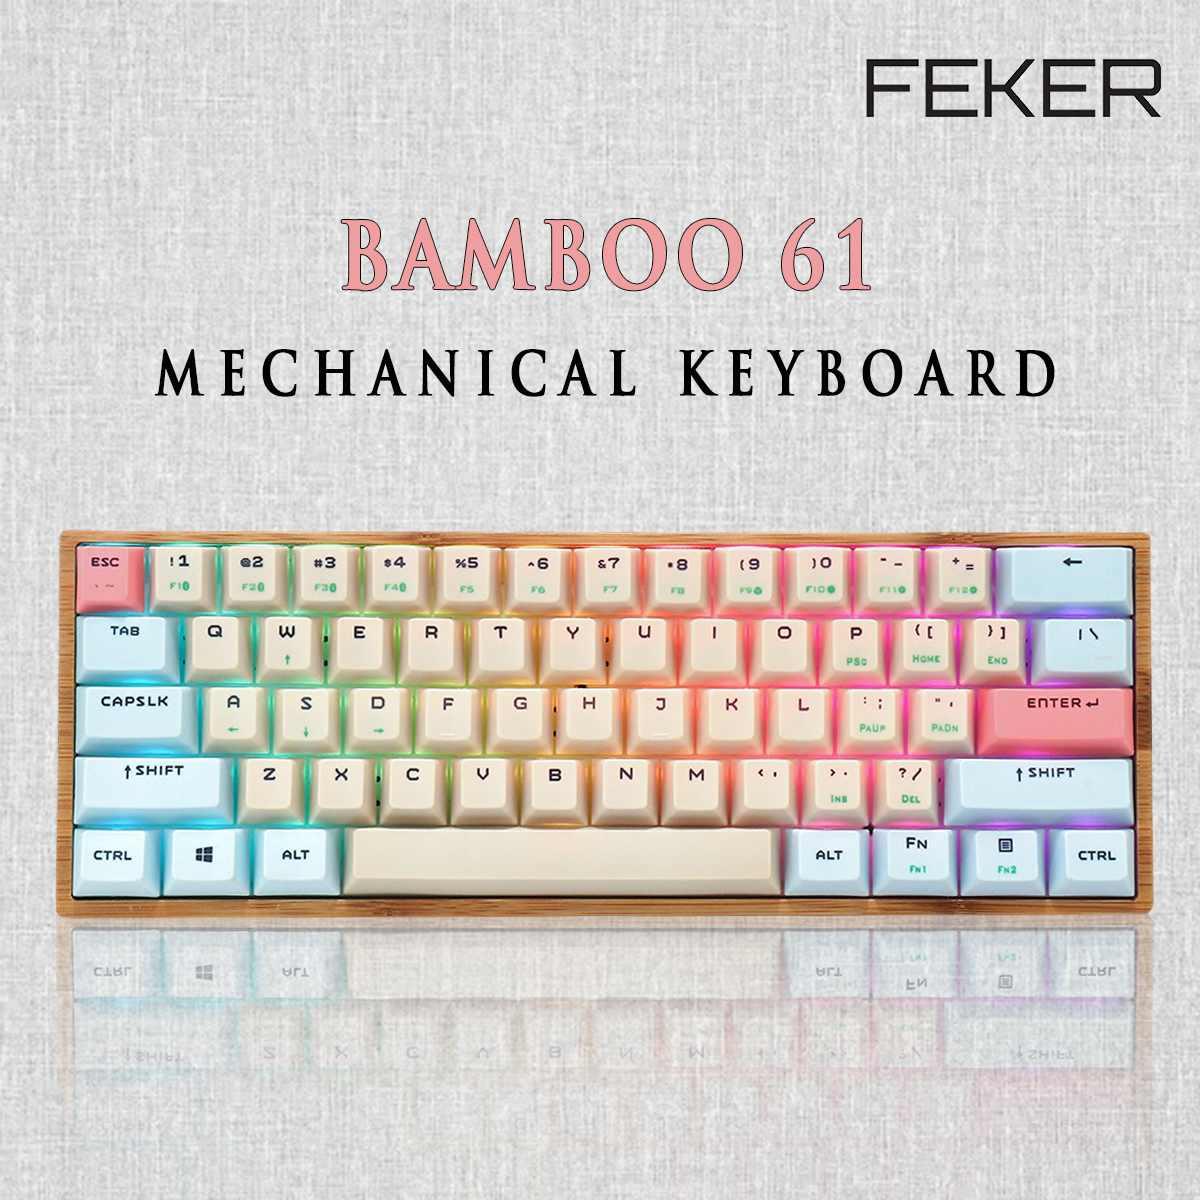 Feker bambu 61 teclado mecânico 60% ansi rgb caixa de madeira modo duplo pbt odmkeycap gateron switches para teclado mecânico